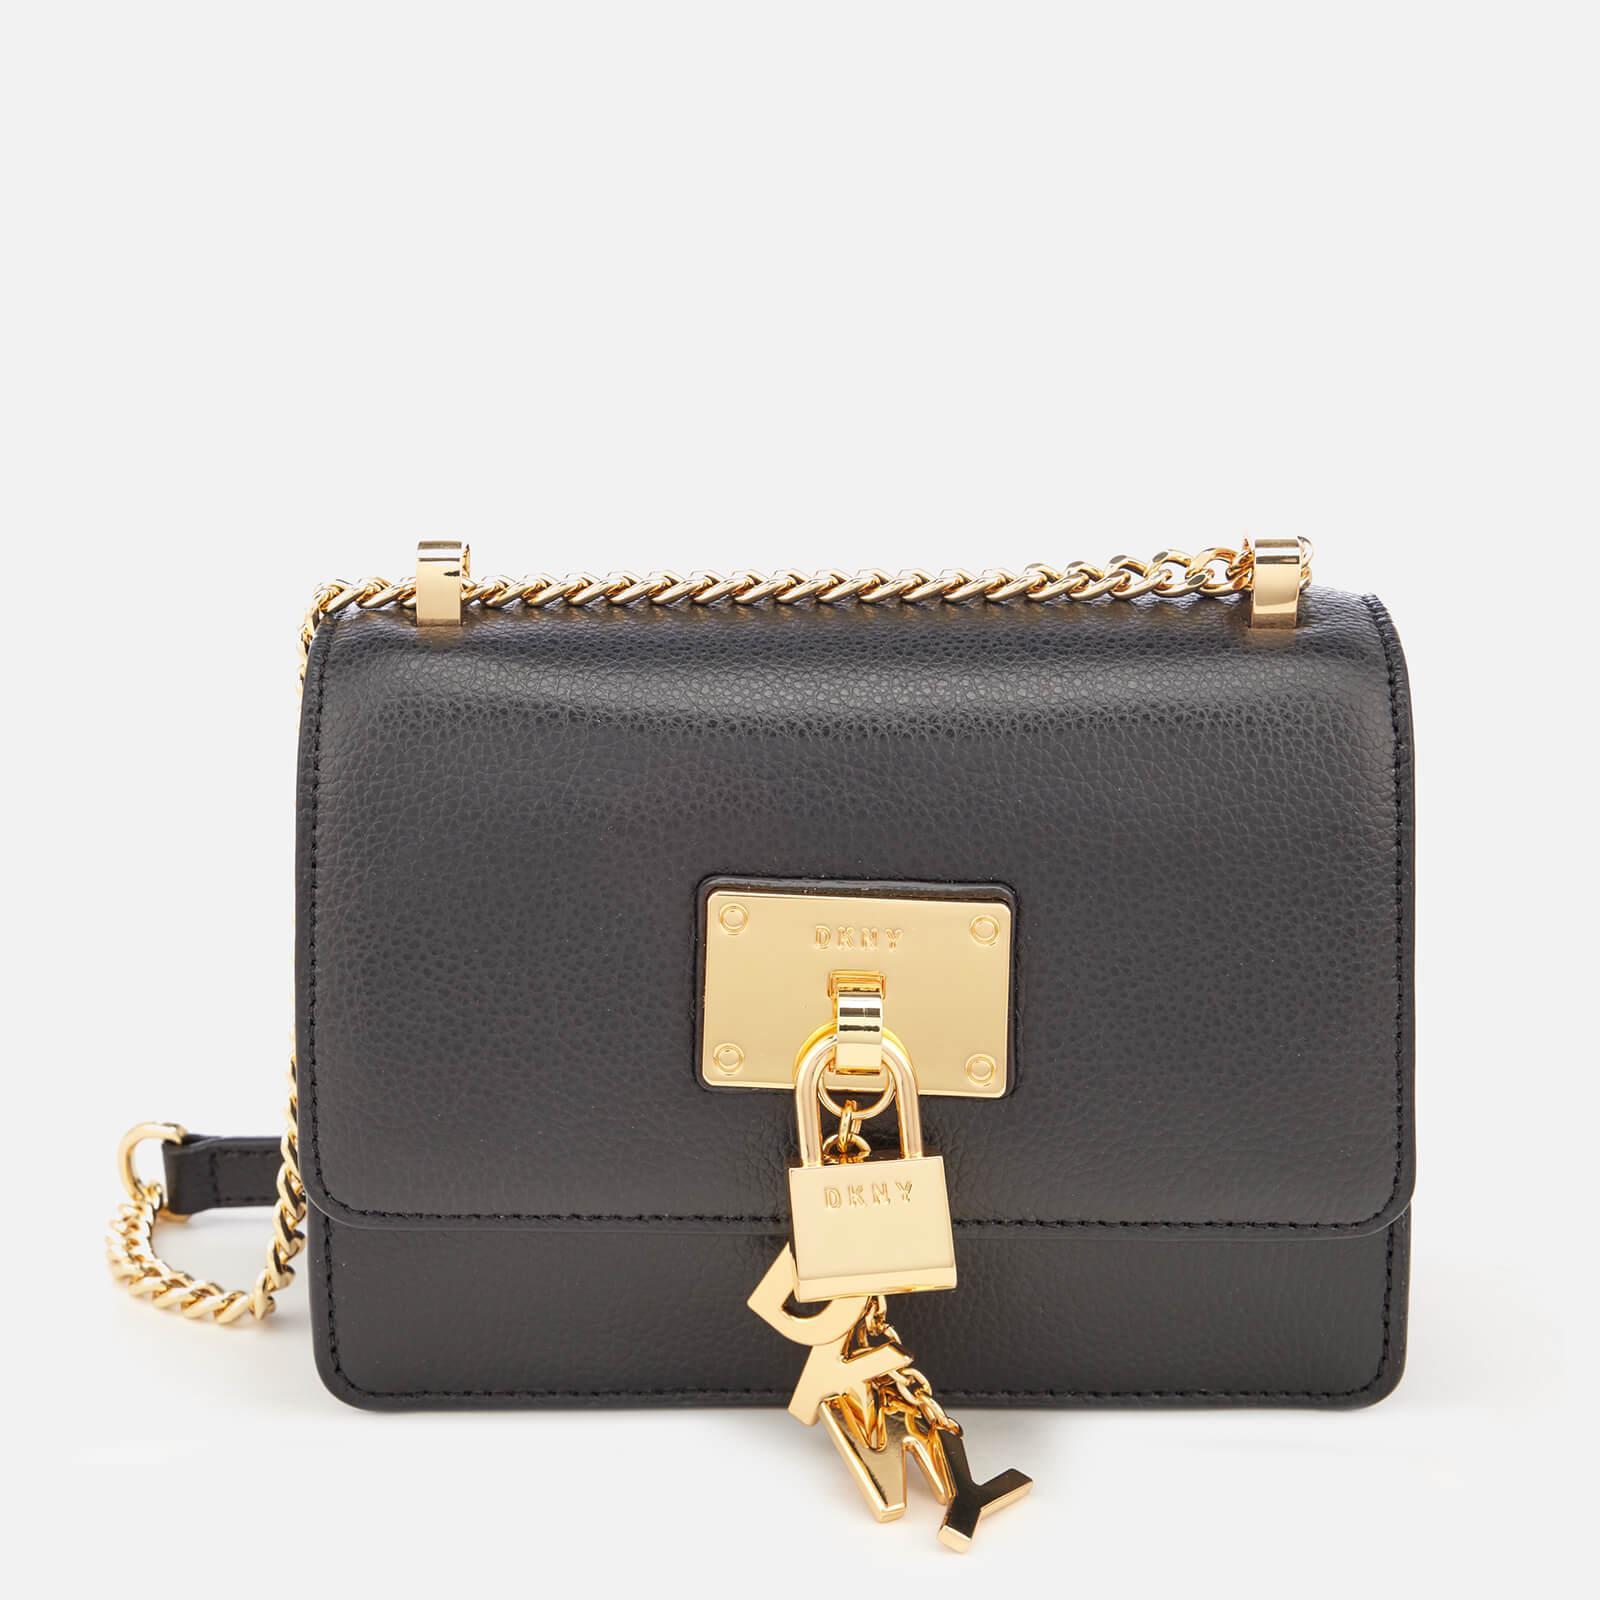 8627c1aae DKNY Elissa Flap Cross Body Bag - Lyst